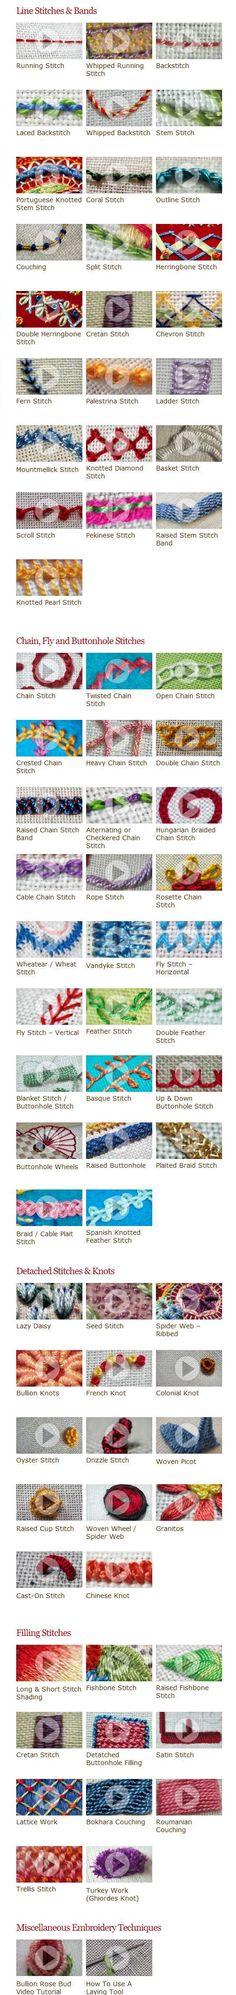 emboroidery stitches video tutorial